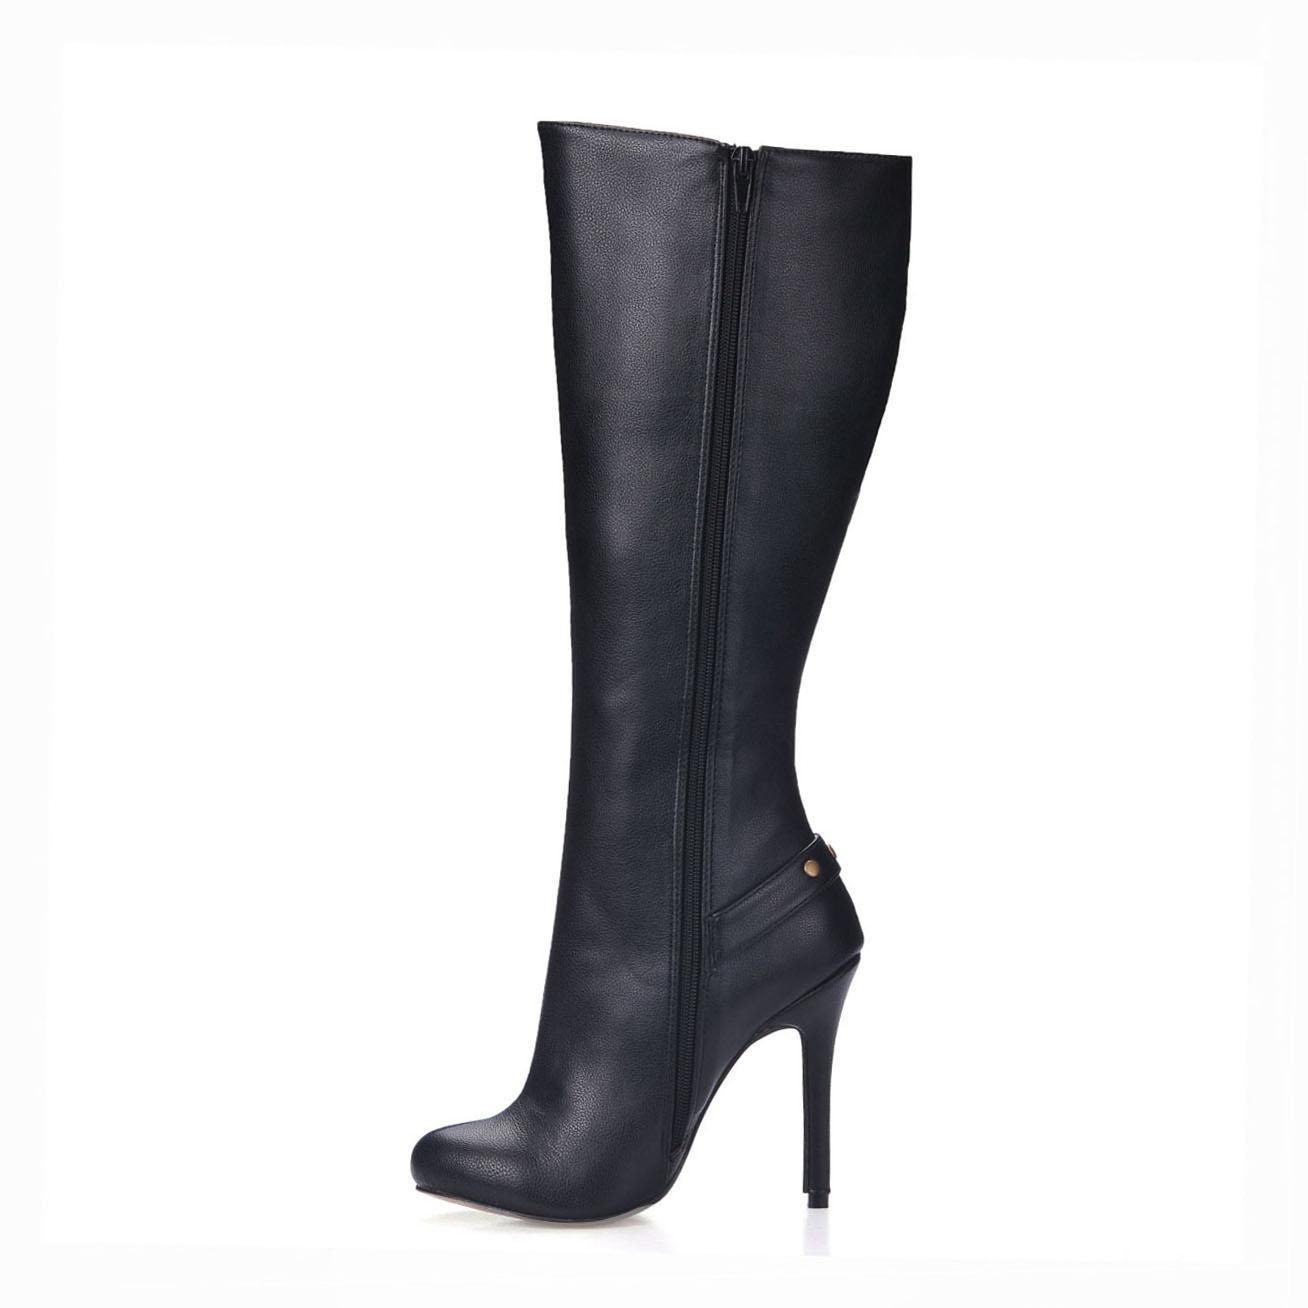 KUKIE Best 4U® Frauen Frauen 4U® Kniehohe Stiefel Premium PU Stiletto Gummisohle 12cm High Heels Spitz Niet Zipper Winter Schuhe schwarz ca441e